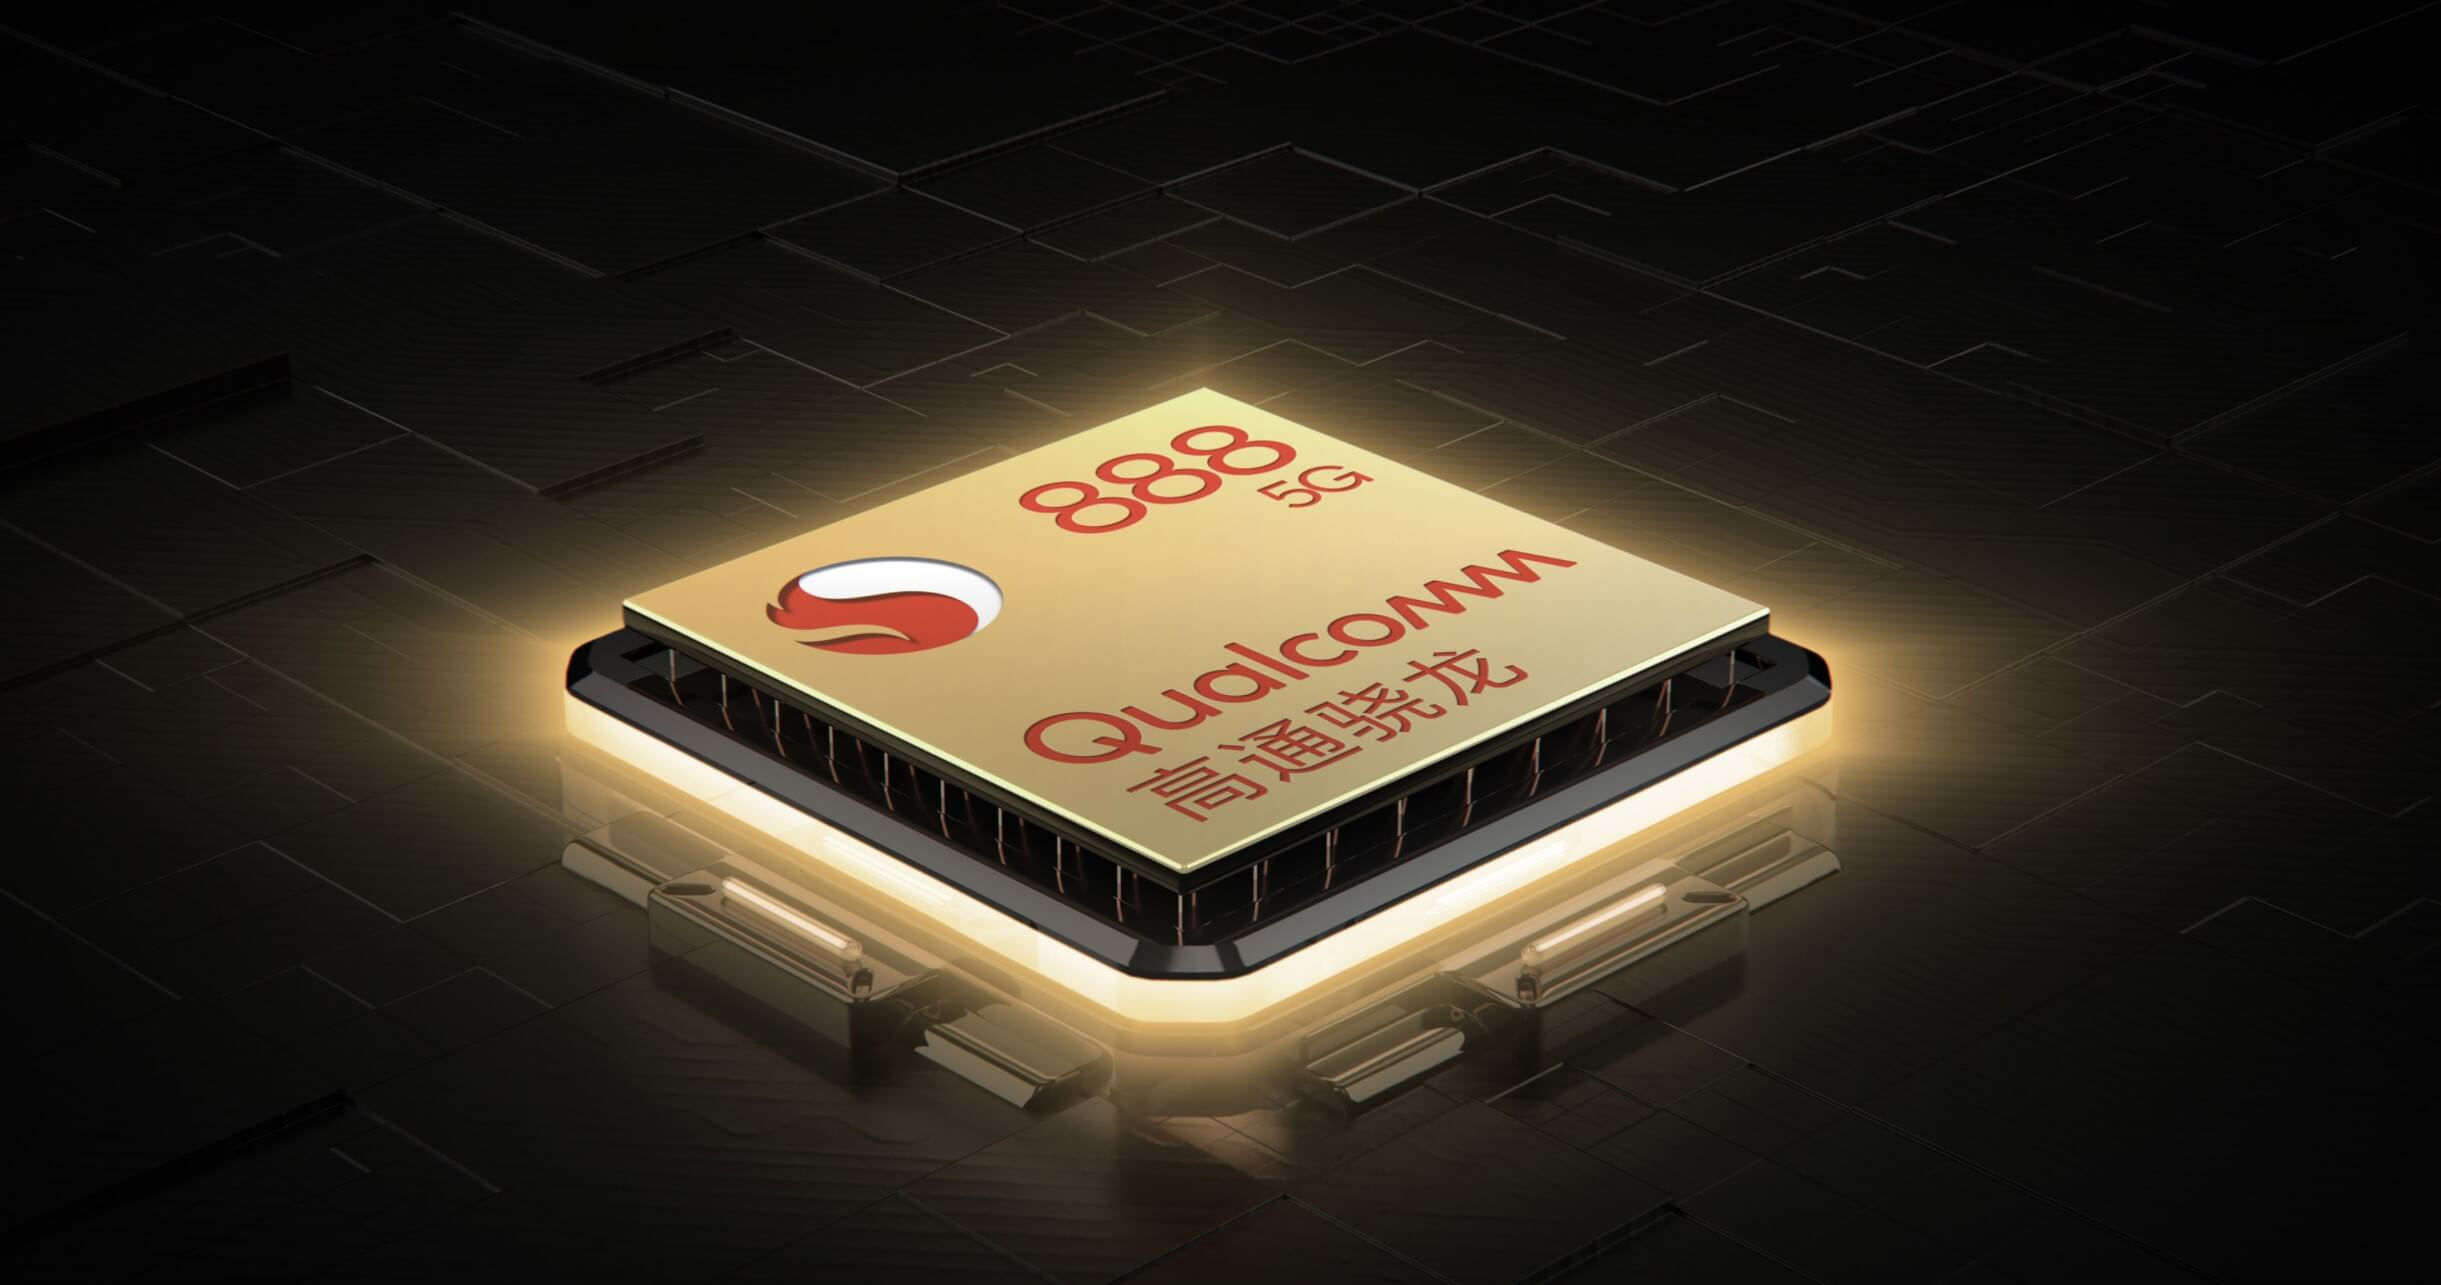 Xiaomi Redmi K40 ProシリーズはSocにSnapdragon 888を搭載